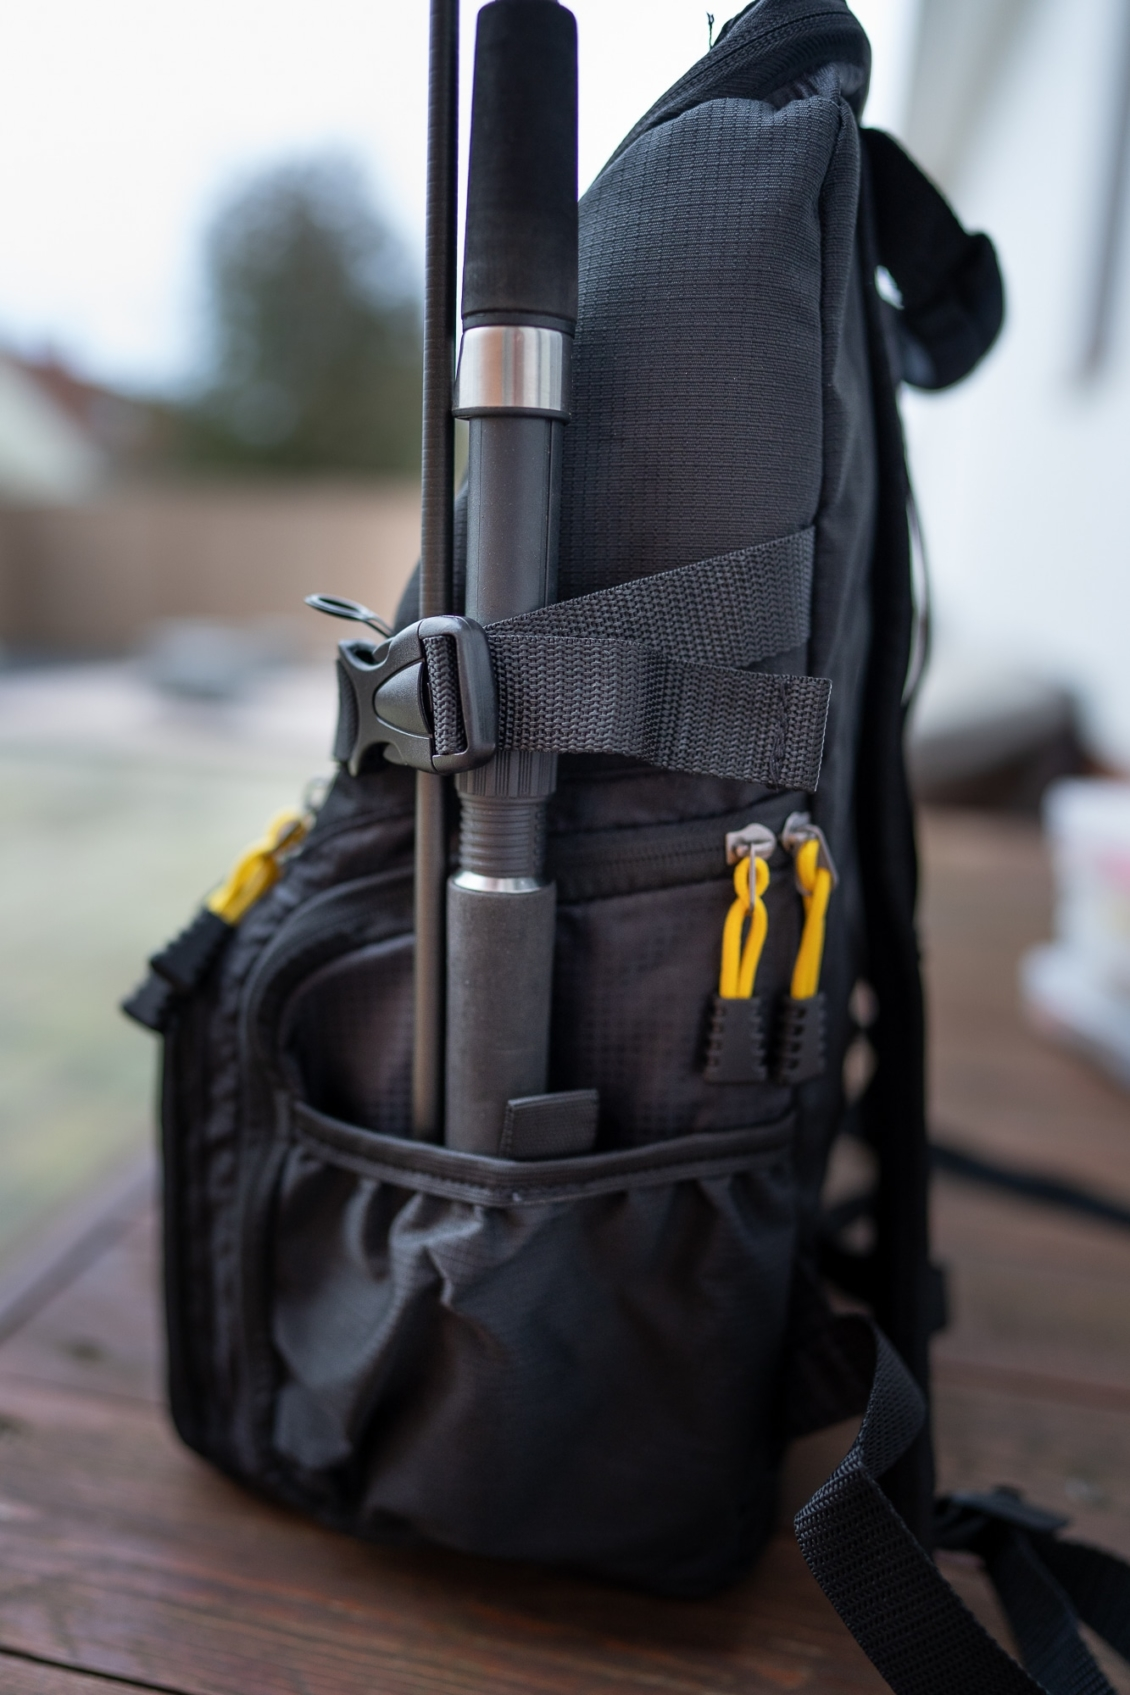 Spro Back Pack Angelrucksack - Rutenhalter